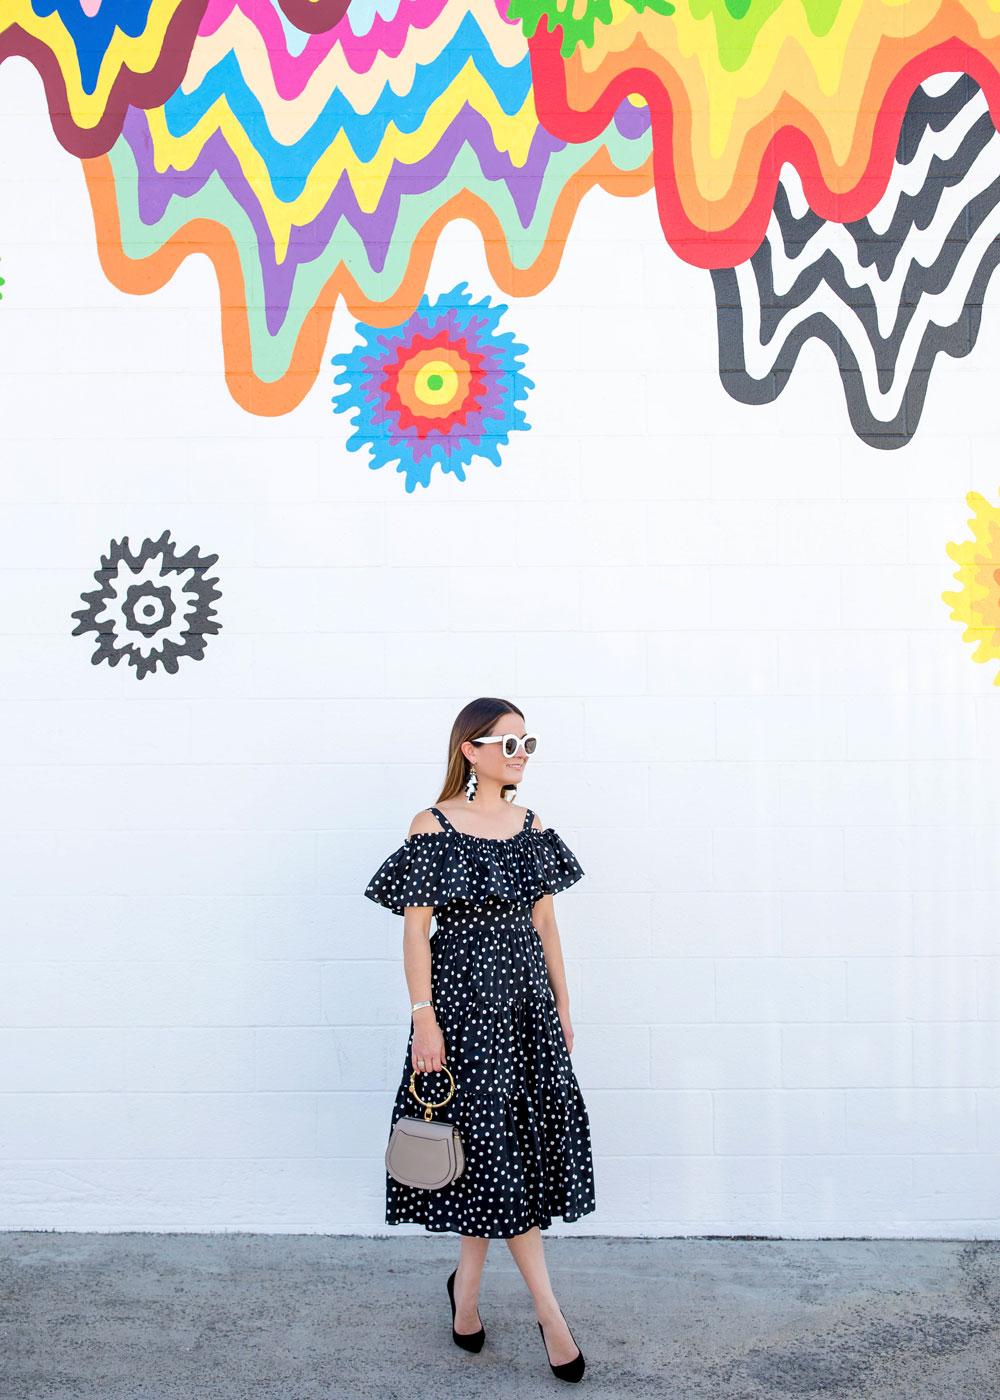 Jen Stark Multicolor Mural Los Angeles